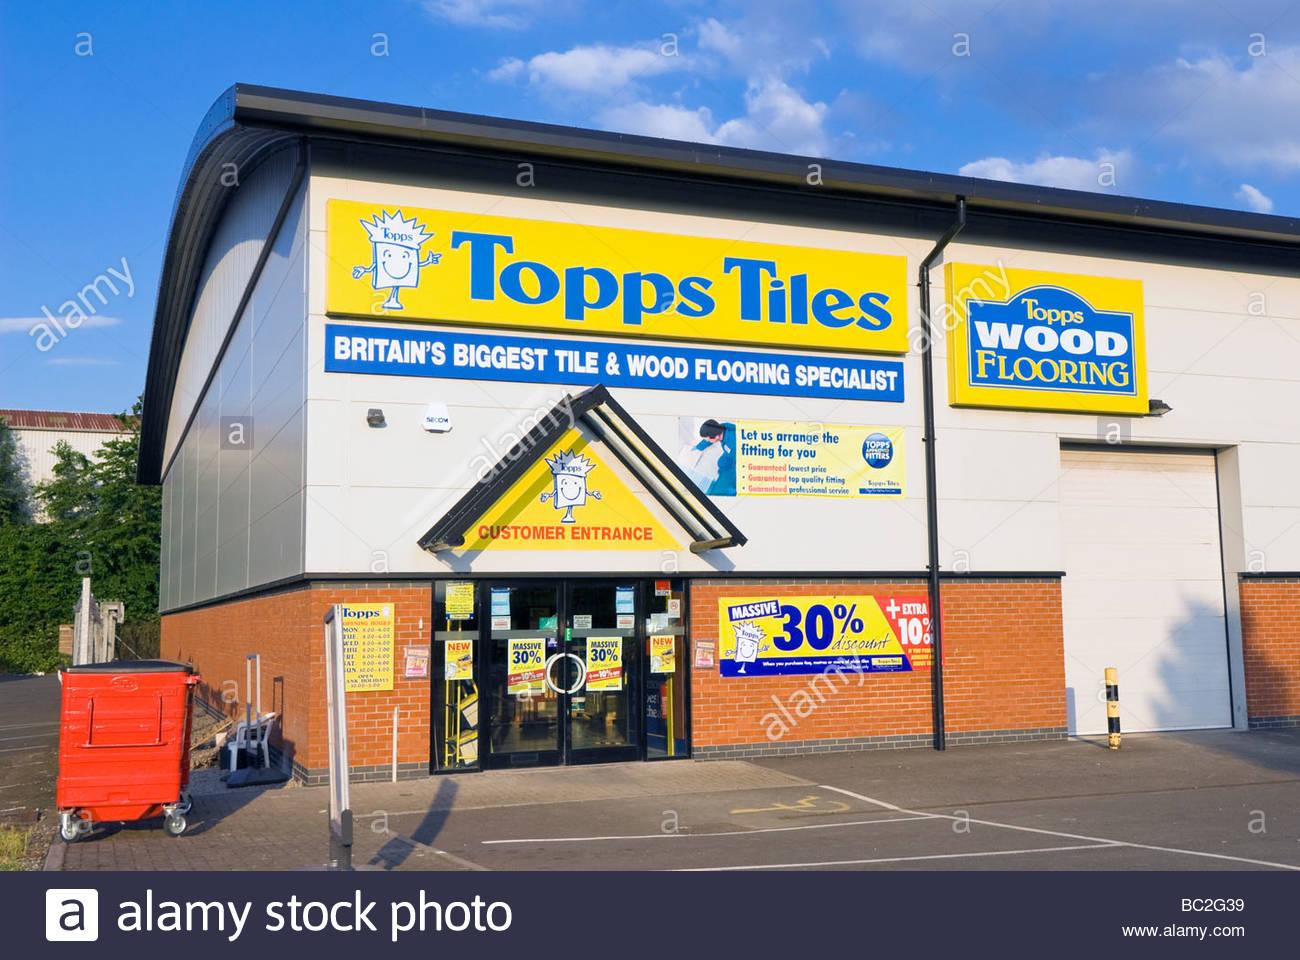 Topps Tiles Britains biggest tile & wood flooring specialist Stock ...